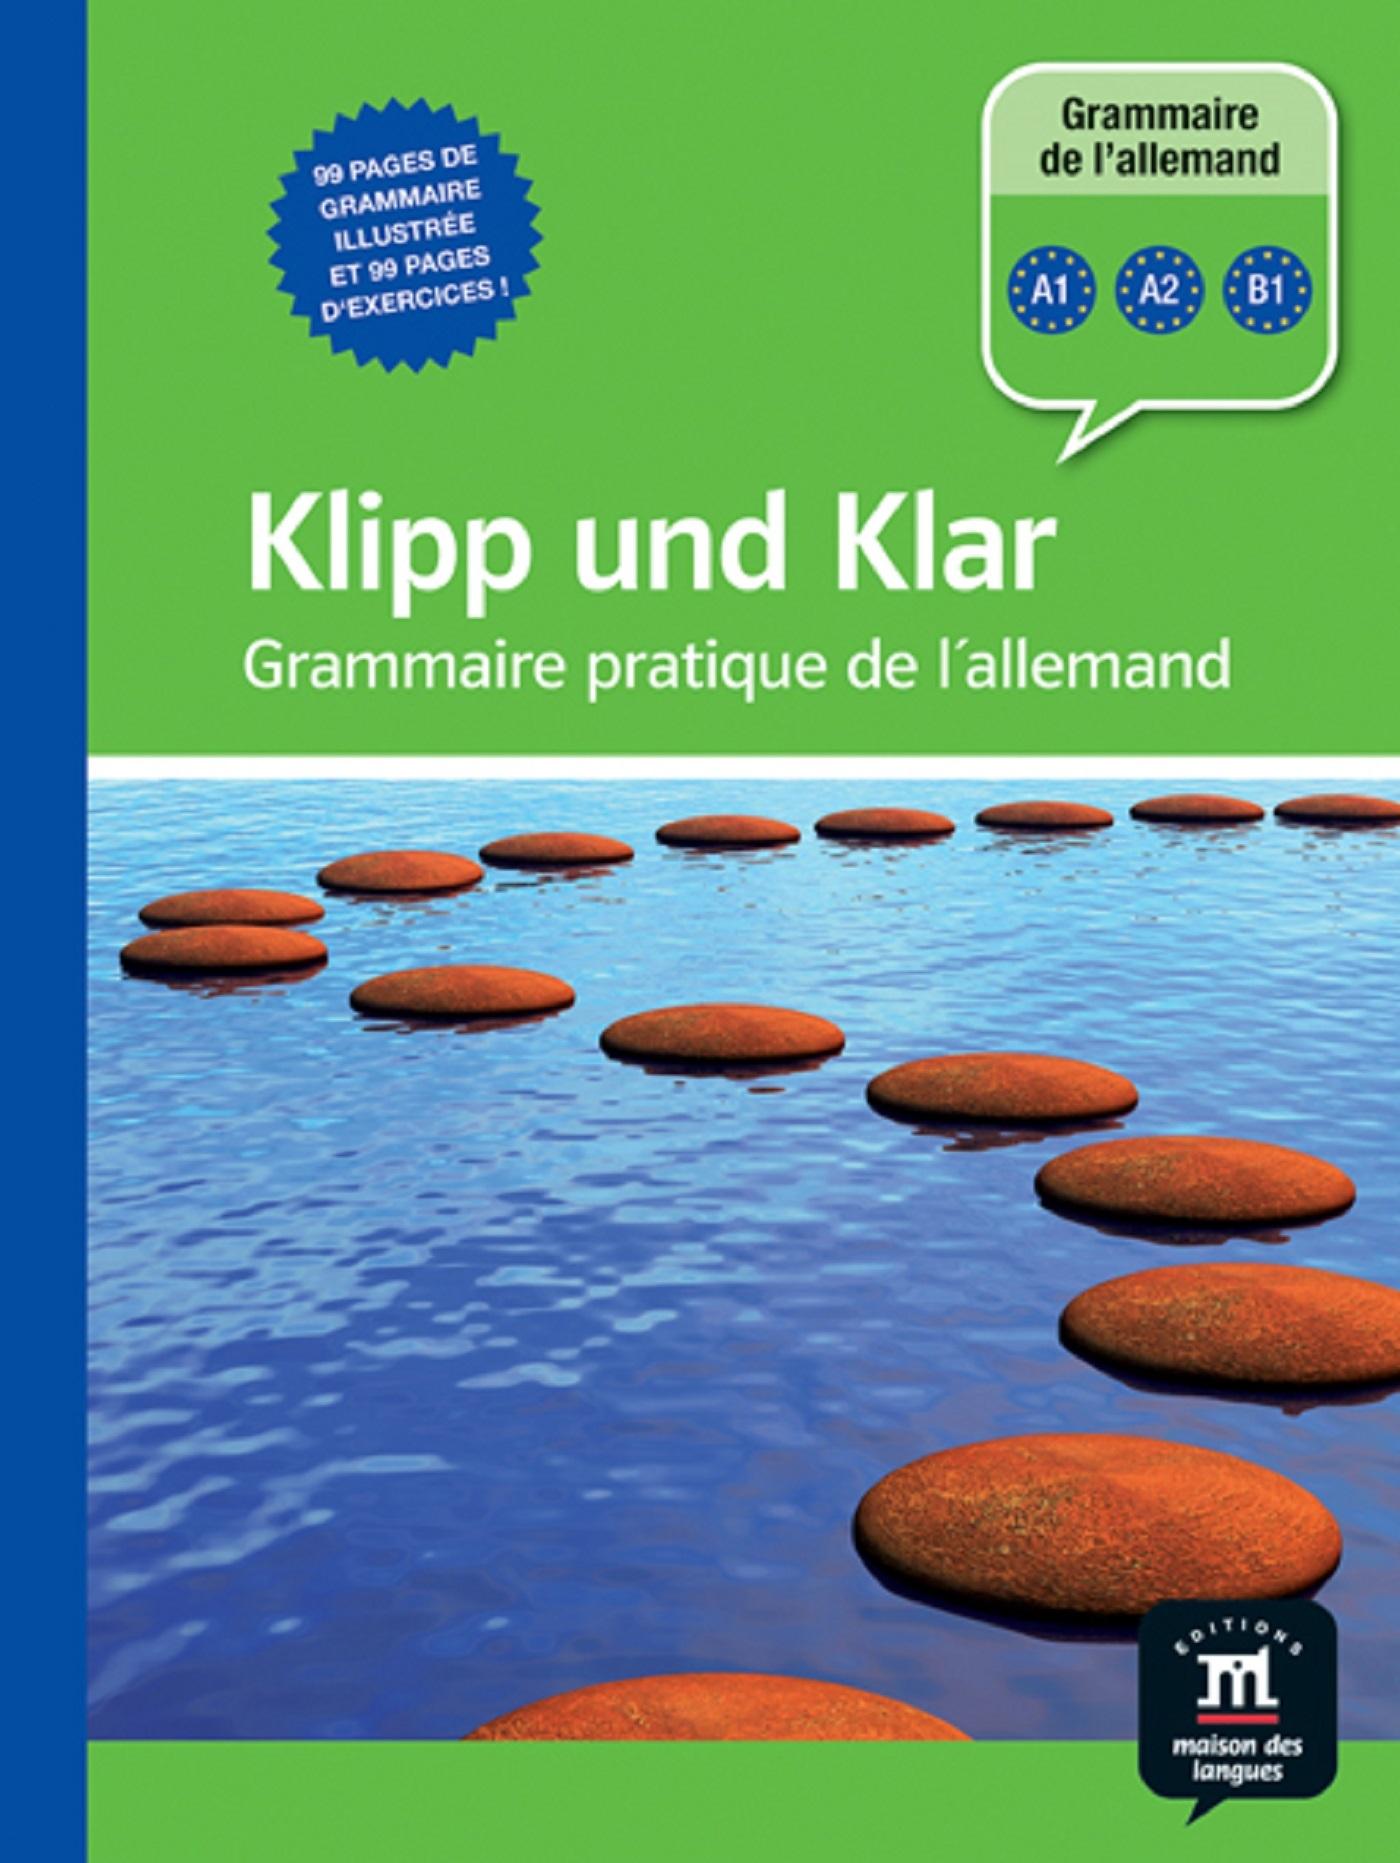 KLIPP UND KLAR ED FRANCAISE